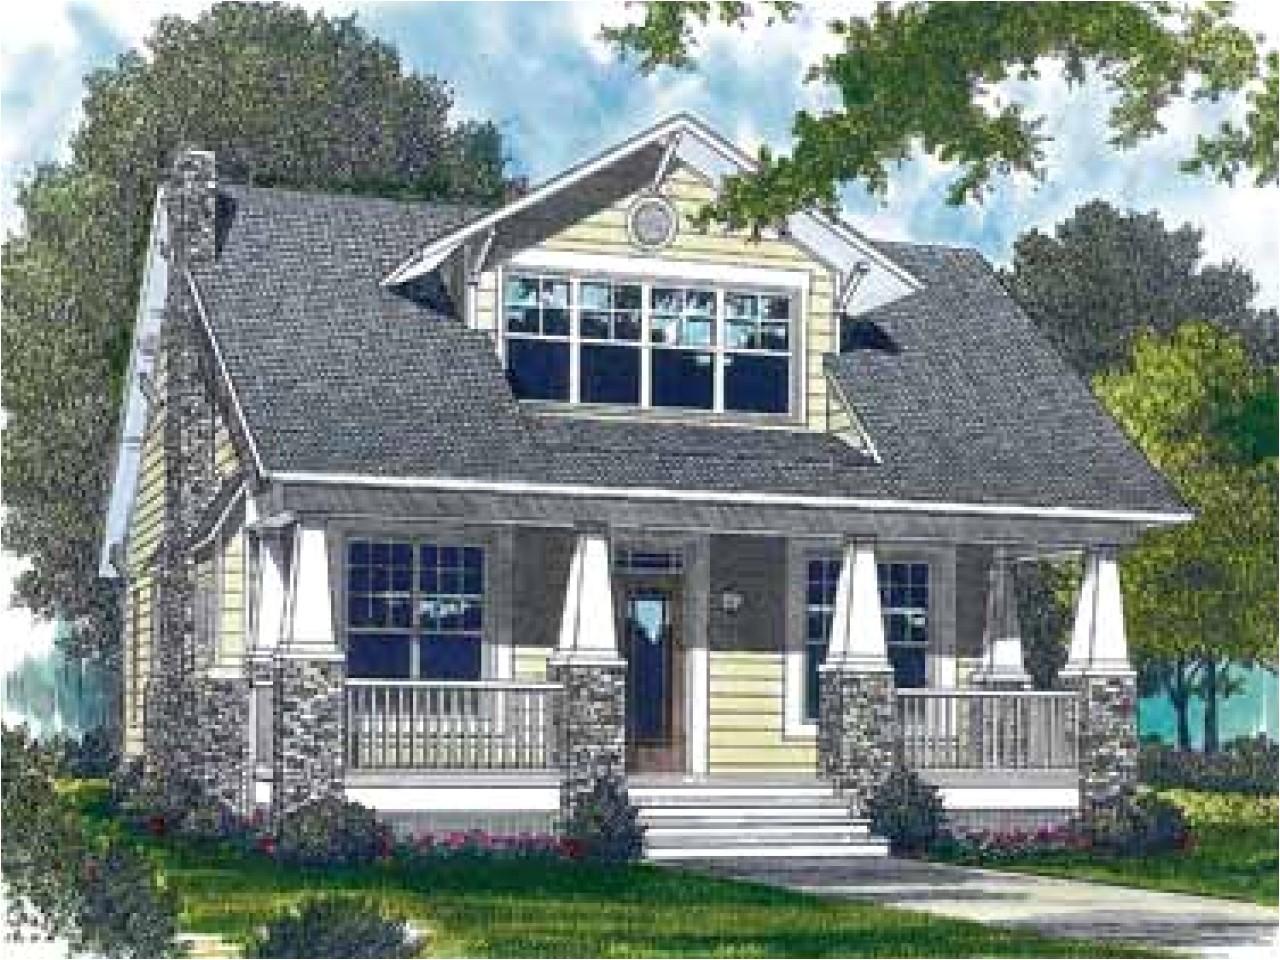 125f923da6858b55 craftsman style bungalow house plans craftsman style porch columns